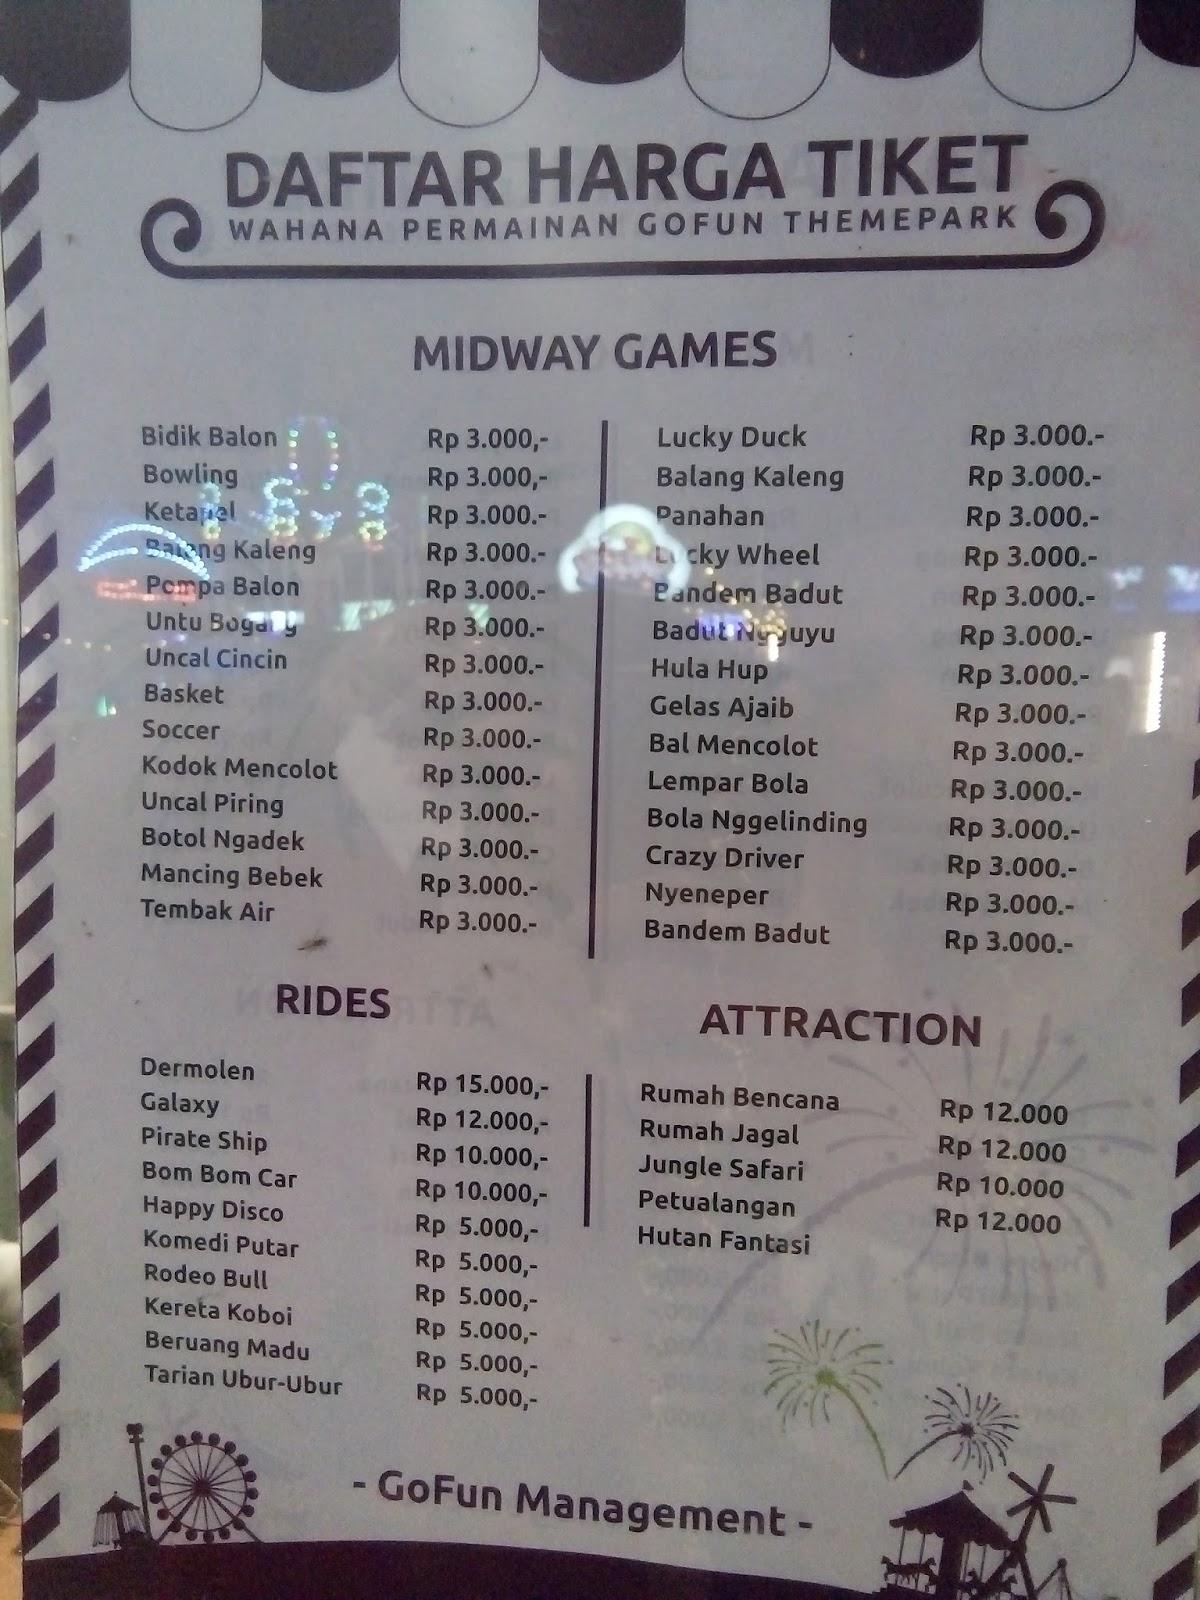 Jalan Gofun Bojonegoro Theme Park Destinasi Wisata Wahana Update Agustus